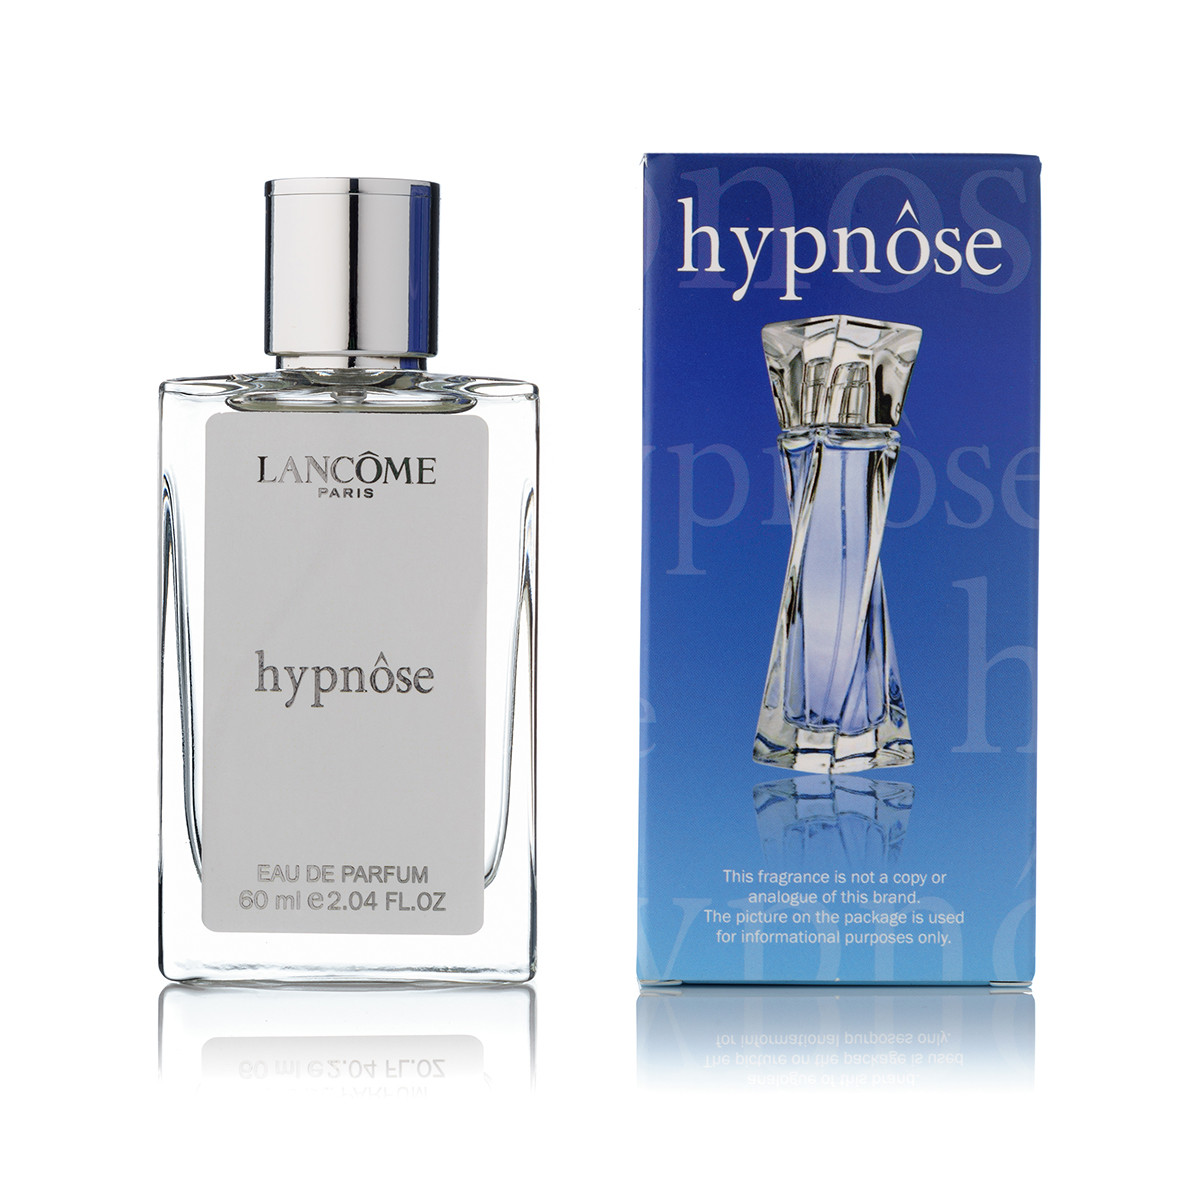 Парфюм Lancome Hypnose женский  - 60 мл